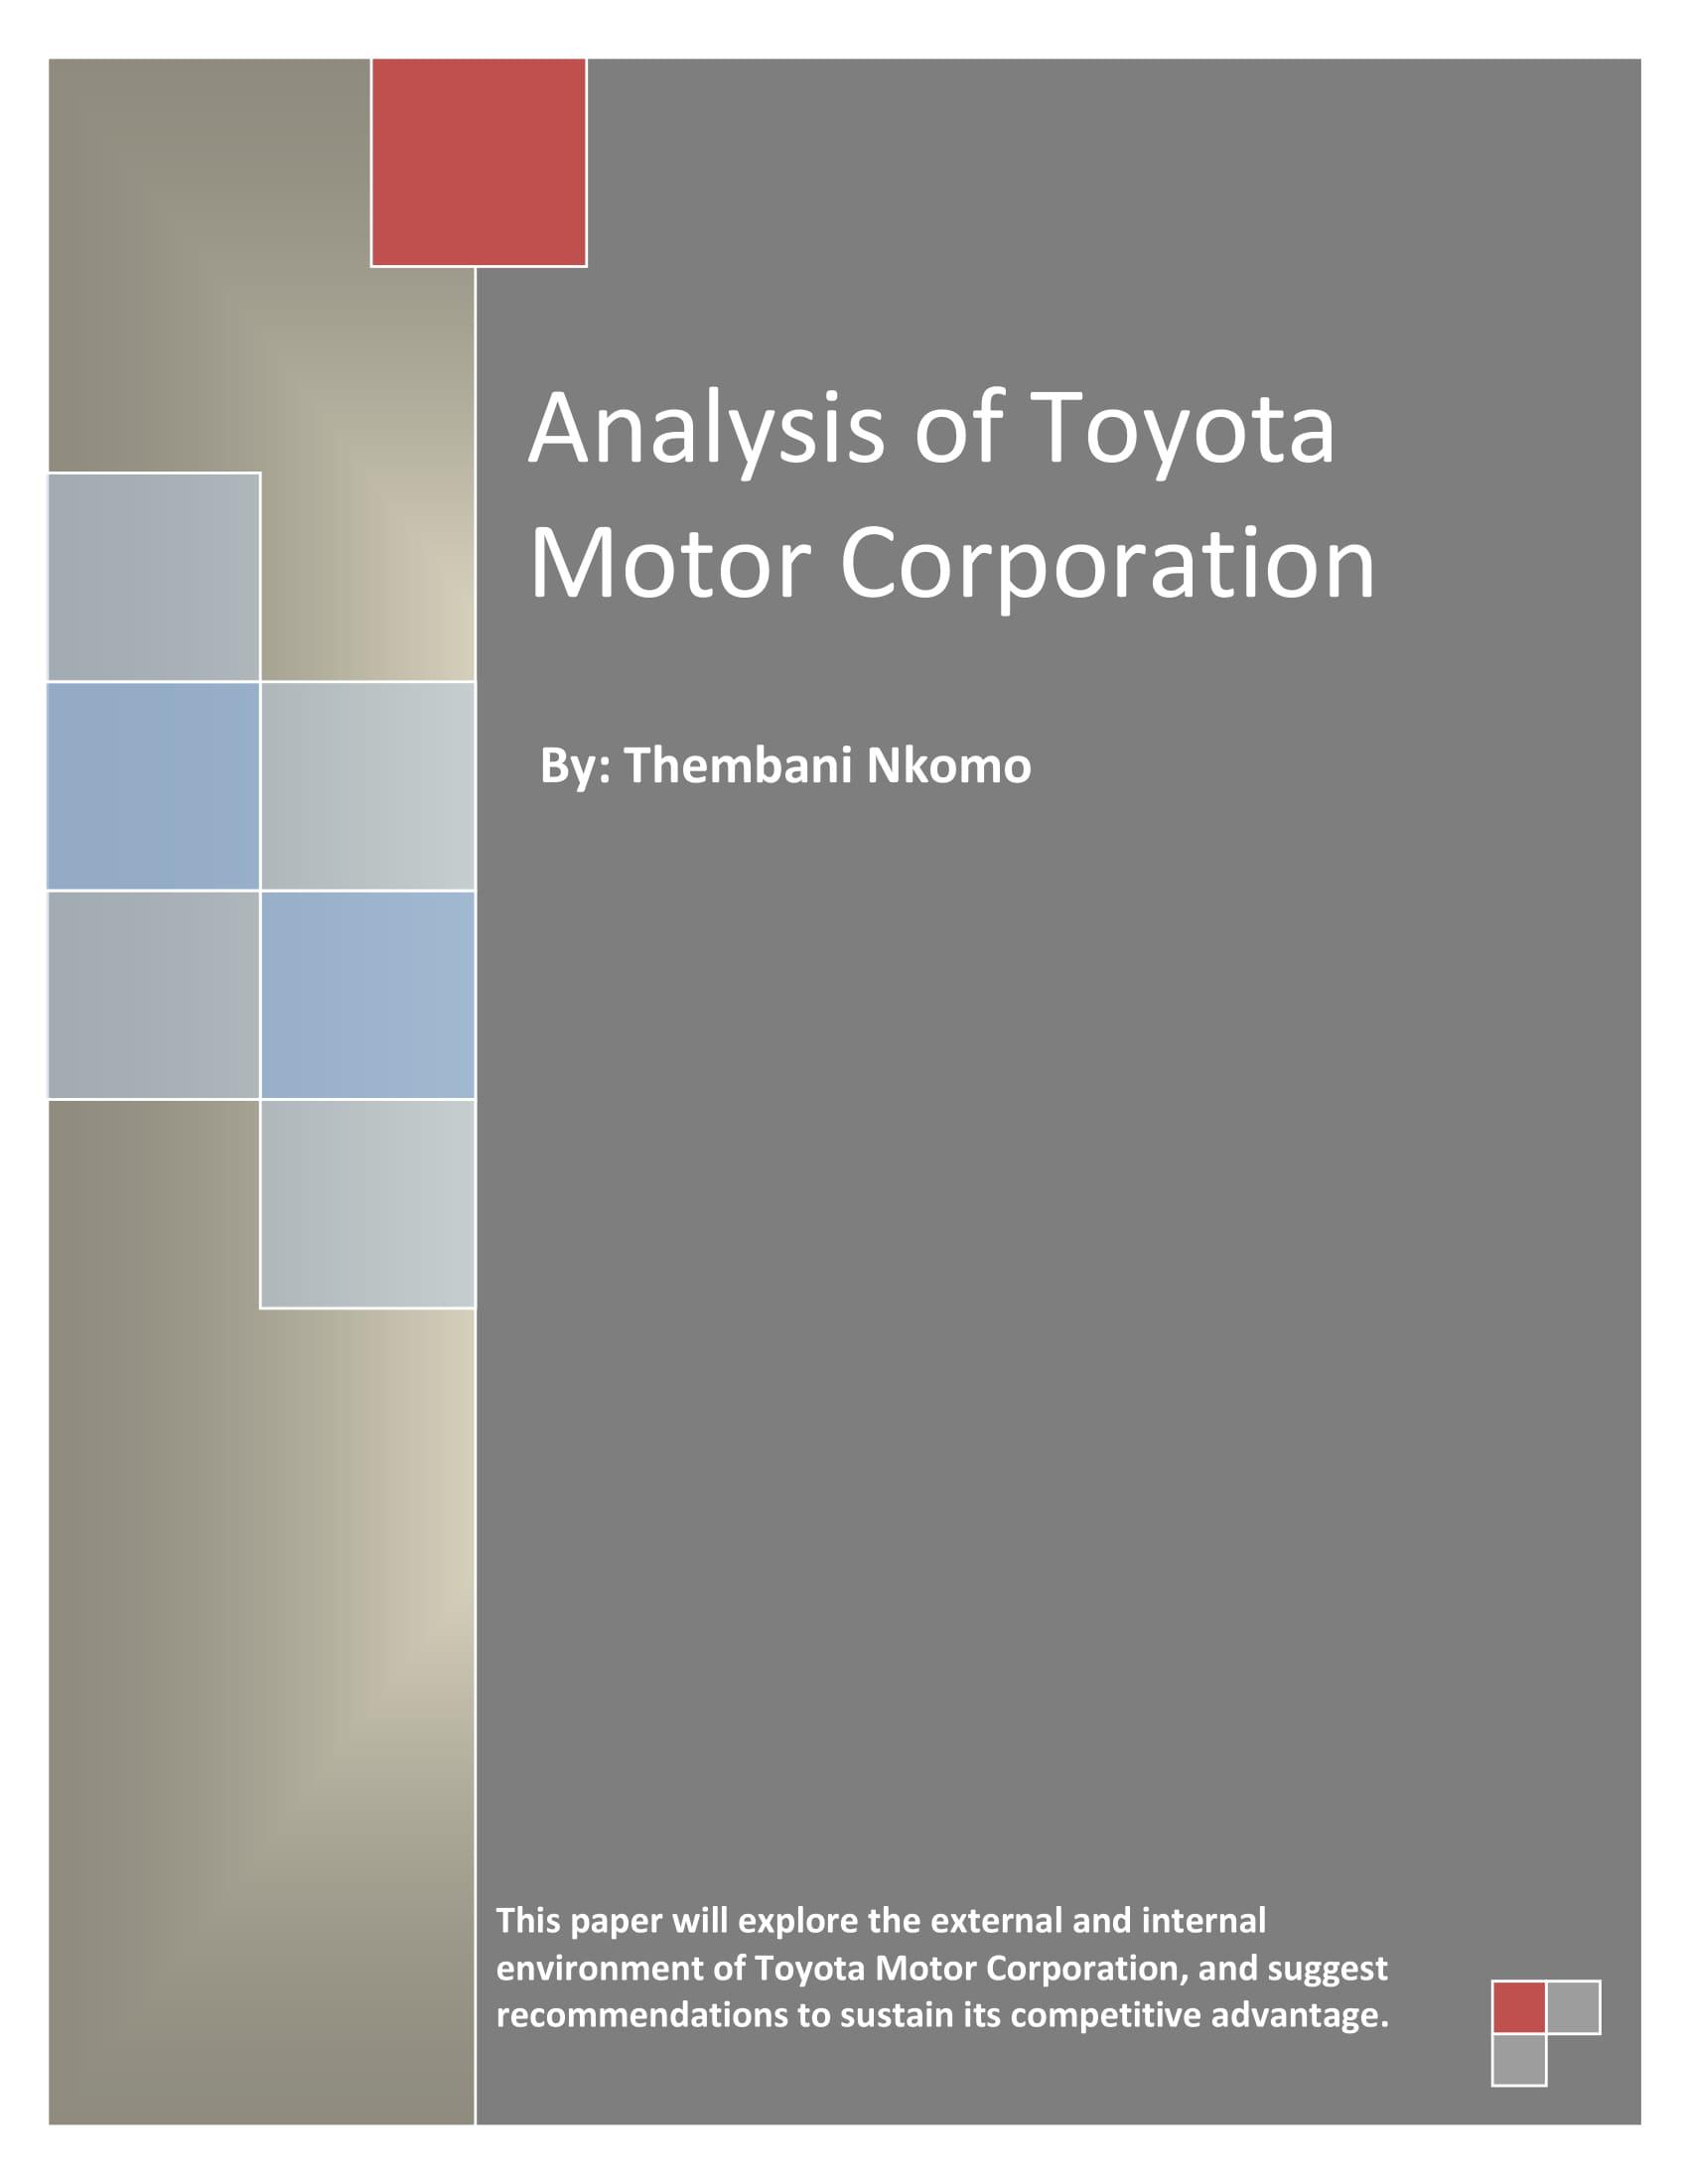 toyota motor corporation company analysis example